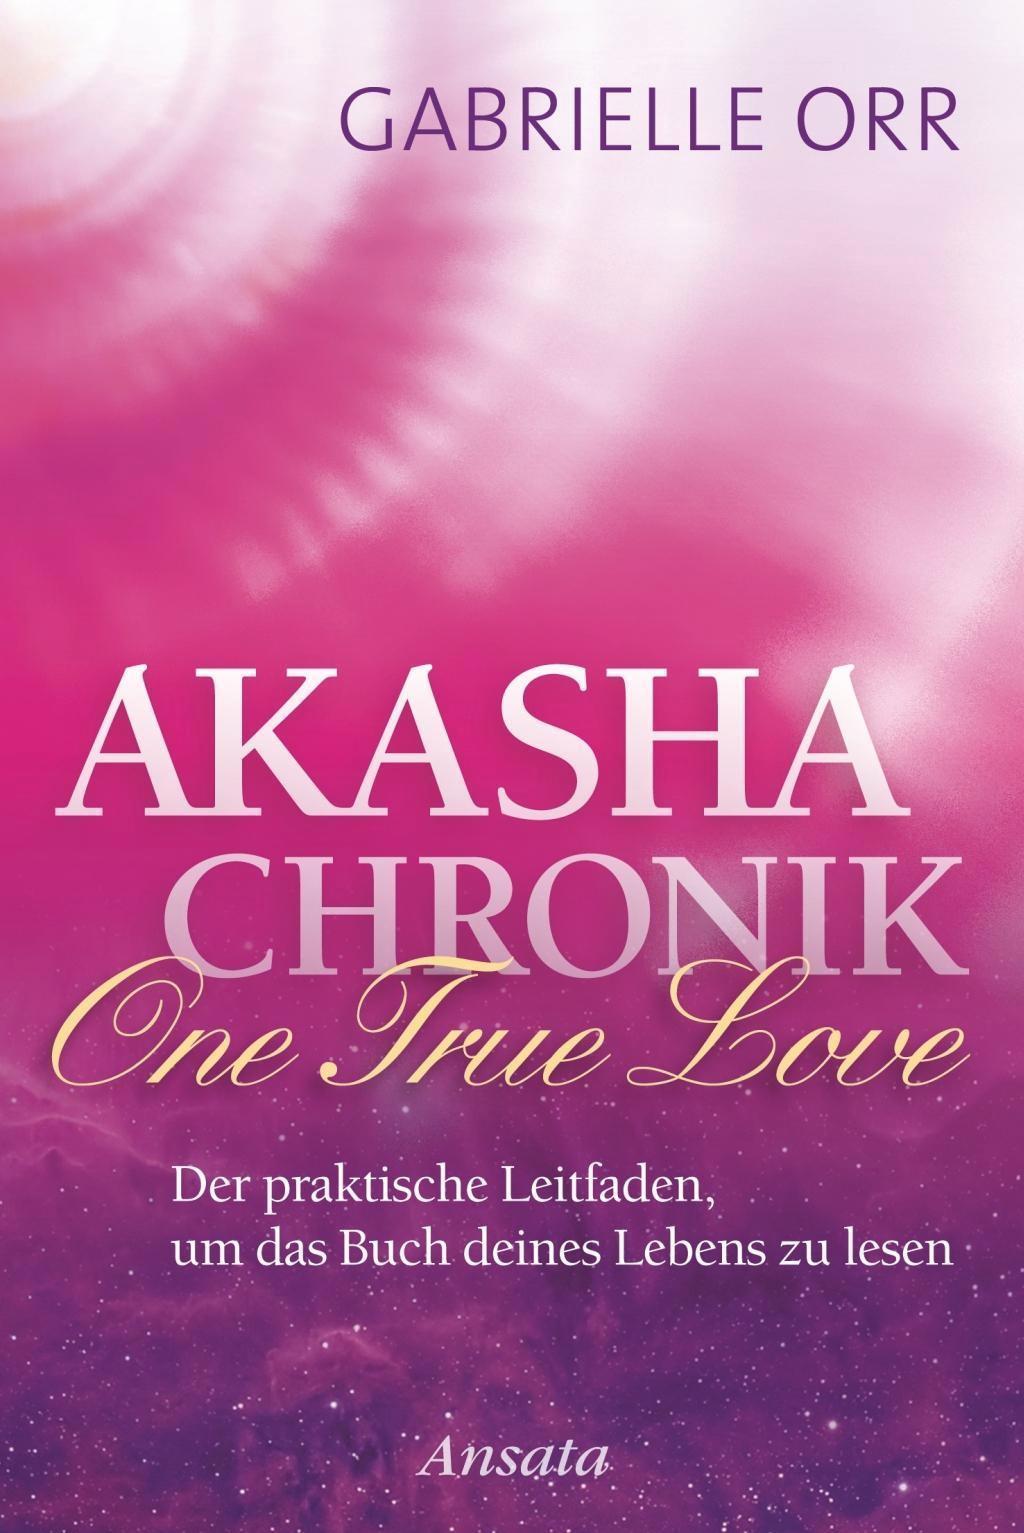 Akasha Chronik One True Love 1